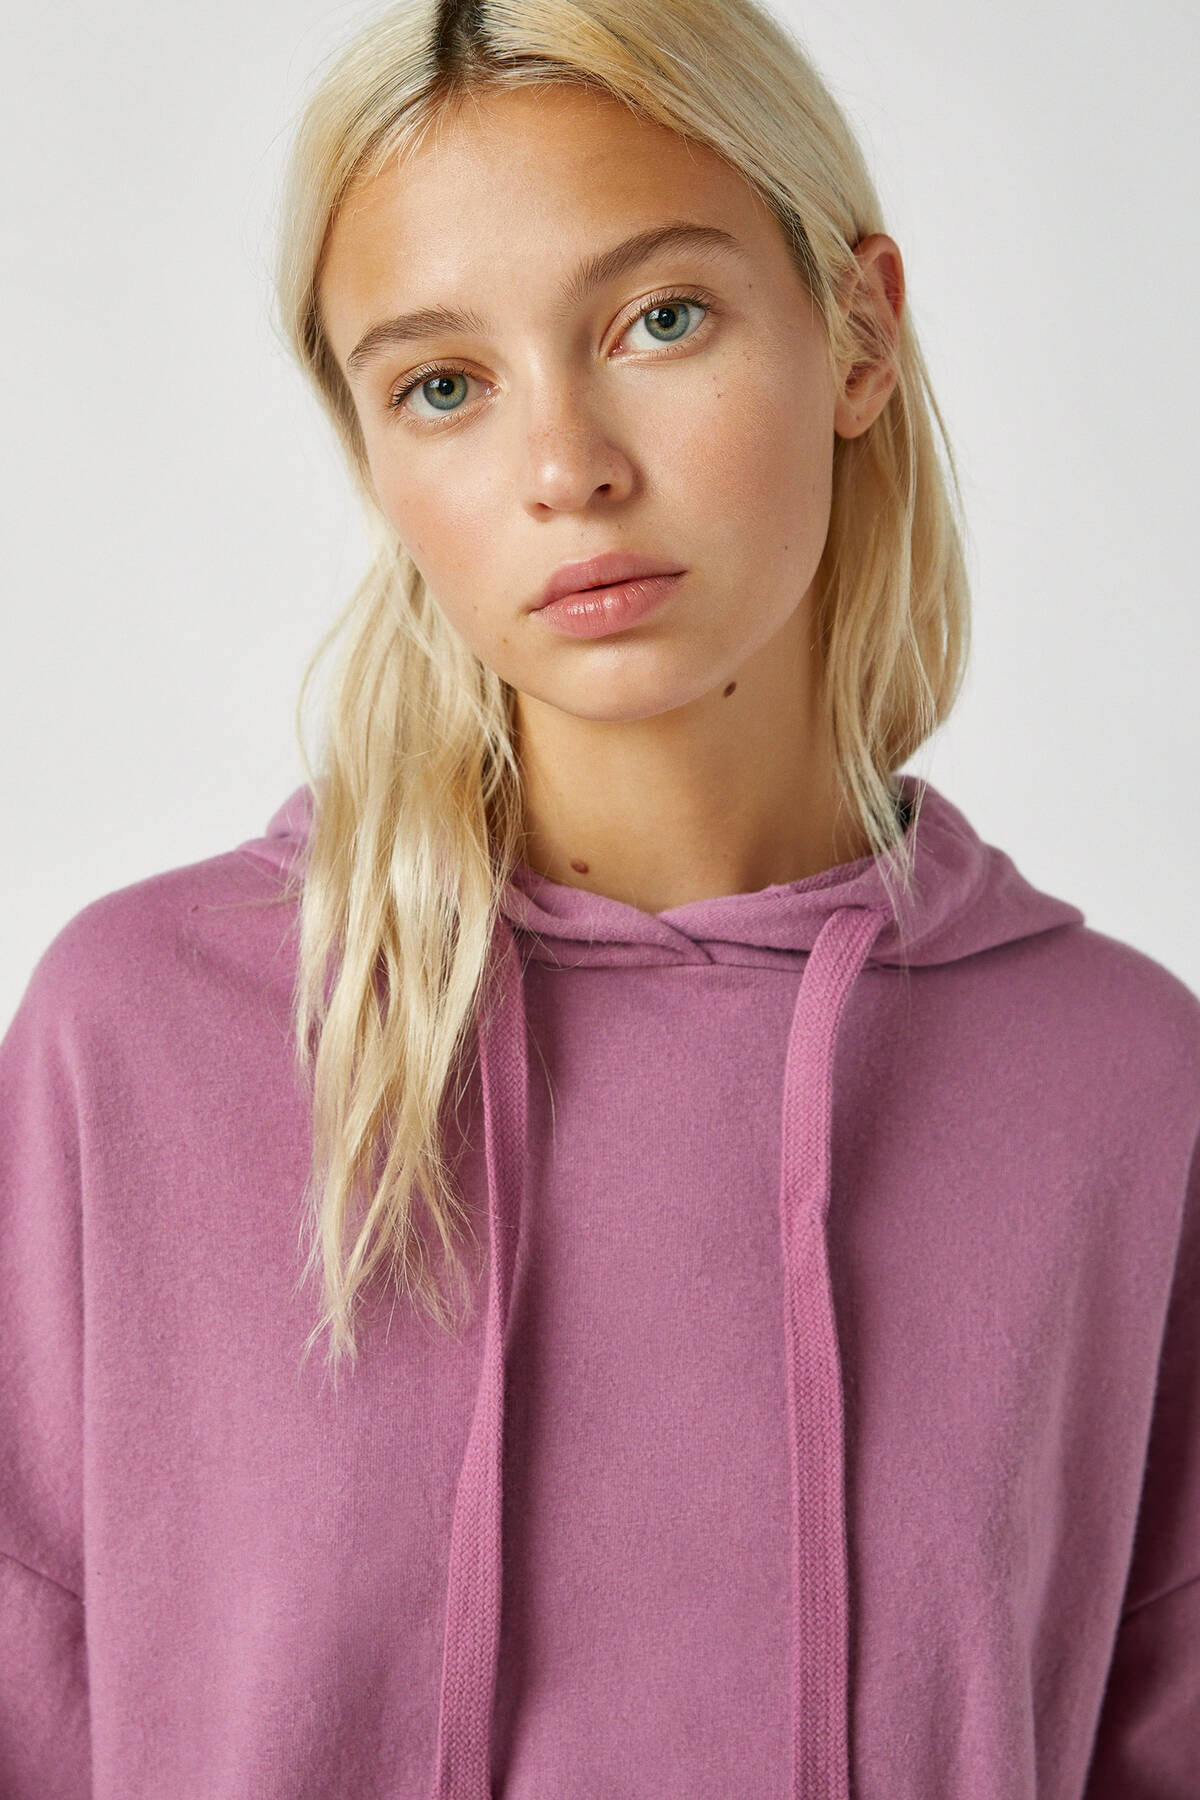 Pull & Bear Kadın Mor Renkli Kapüşonlu Sweatshirt 09594312 3